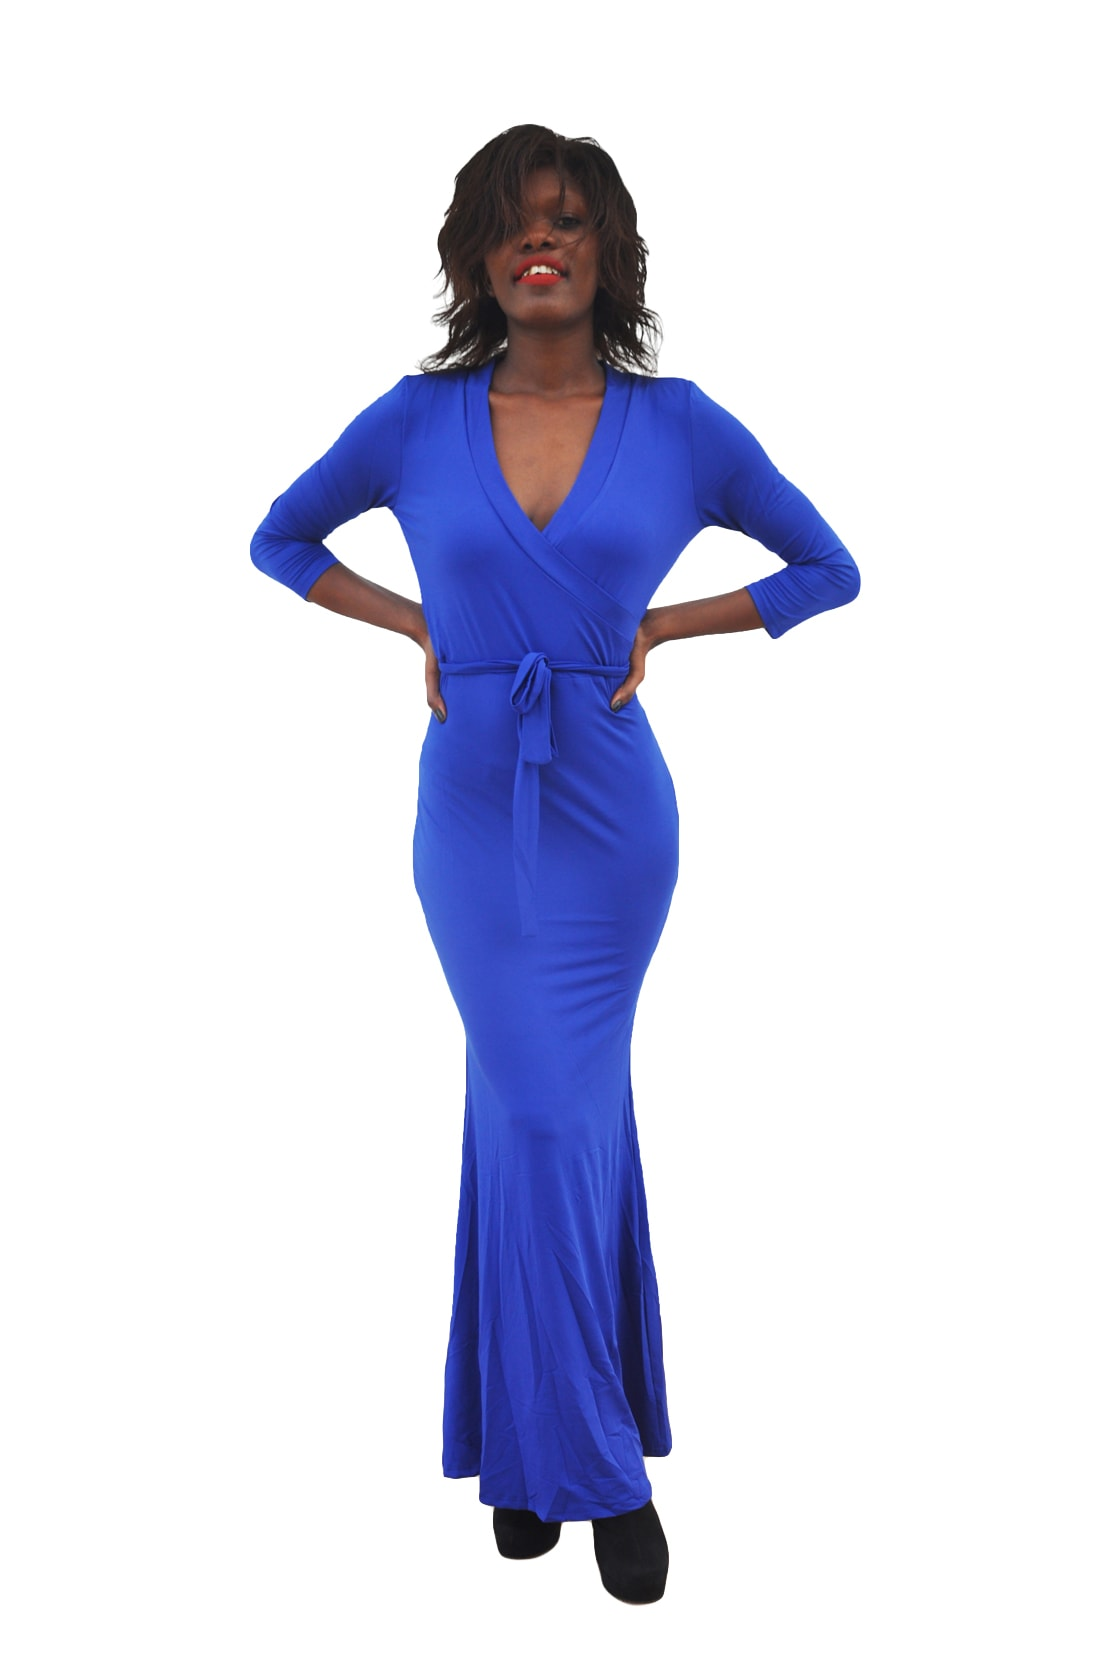 M0230 blue1 Long Sleeve Dresses maureens.com boutique